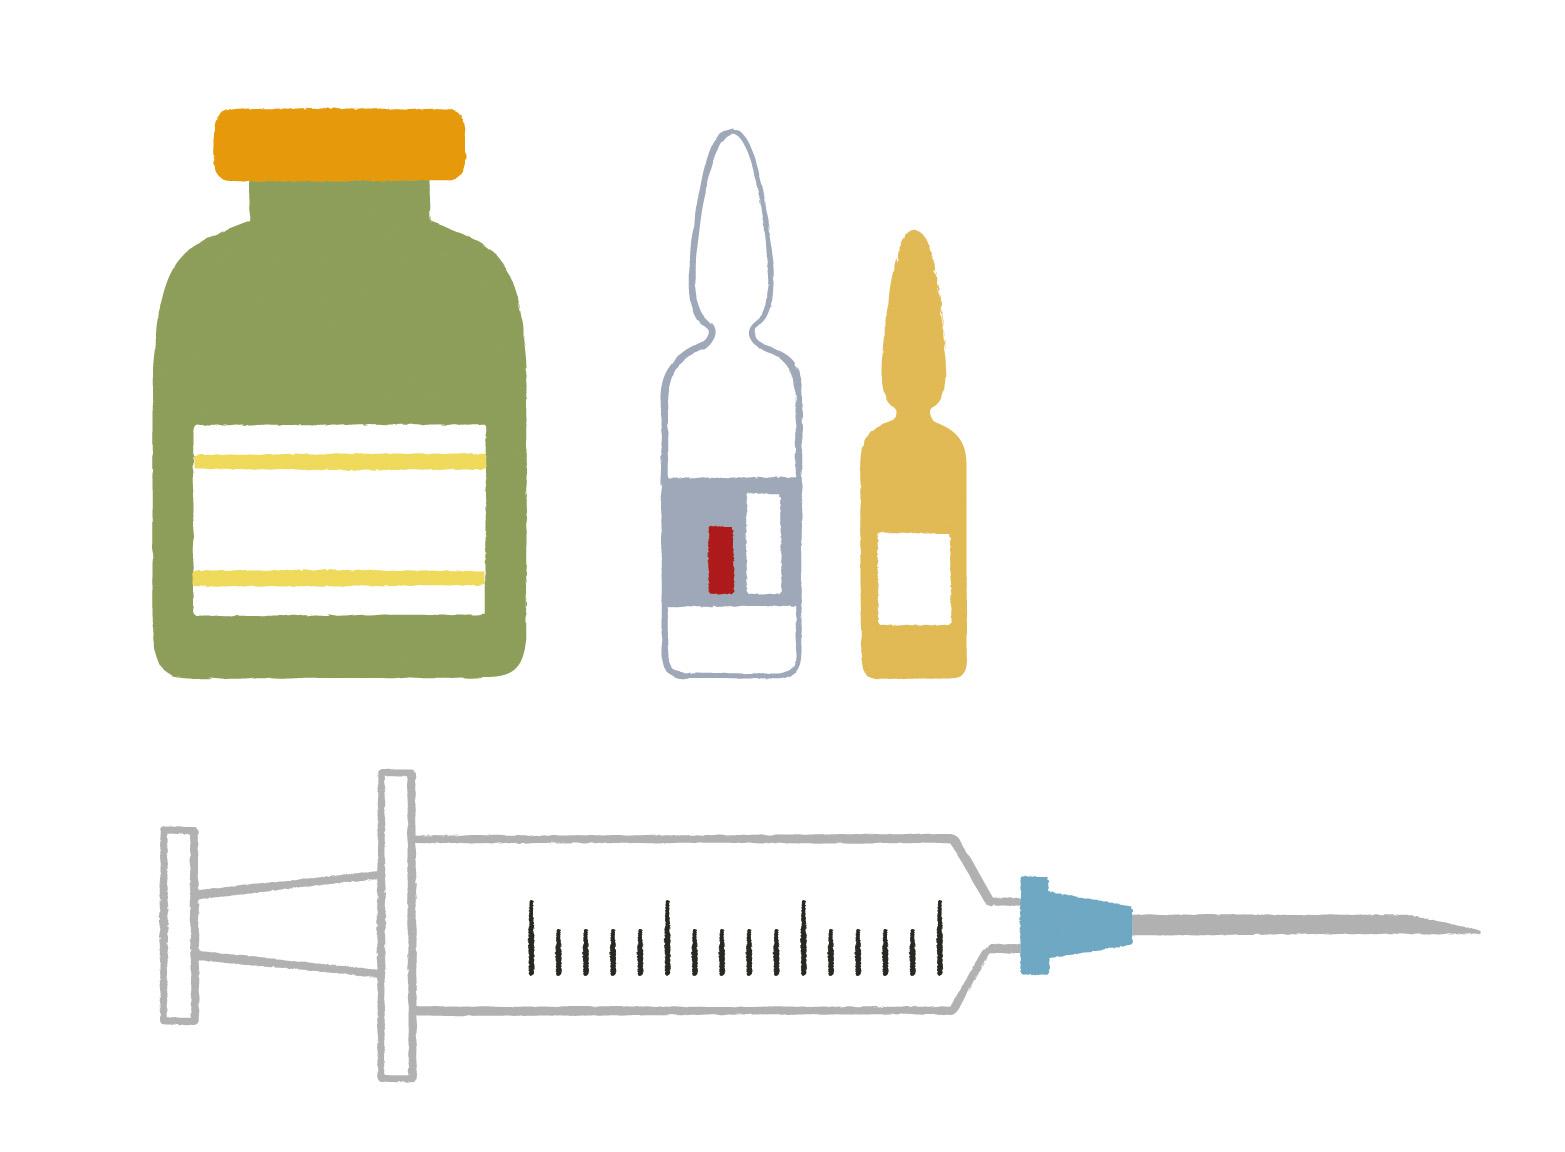 薬剤希釈計算:確認用EXCELシート_2018年版(β仕様)